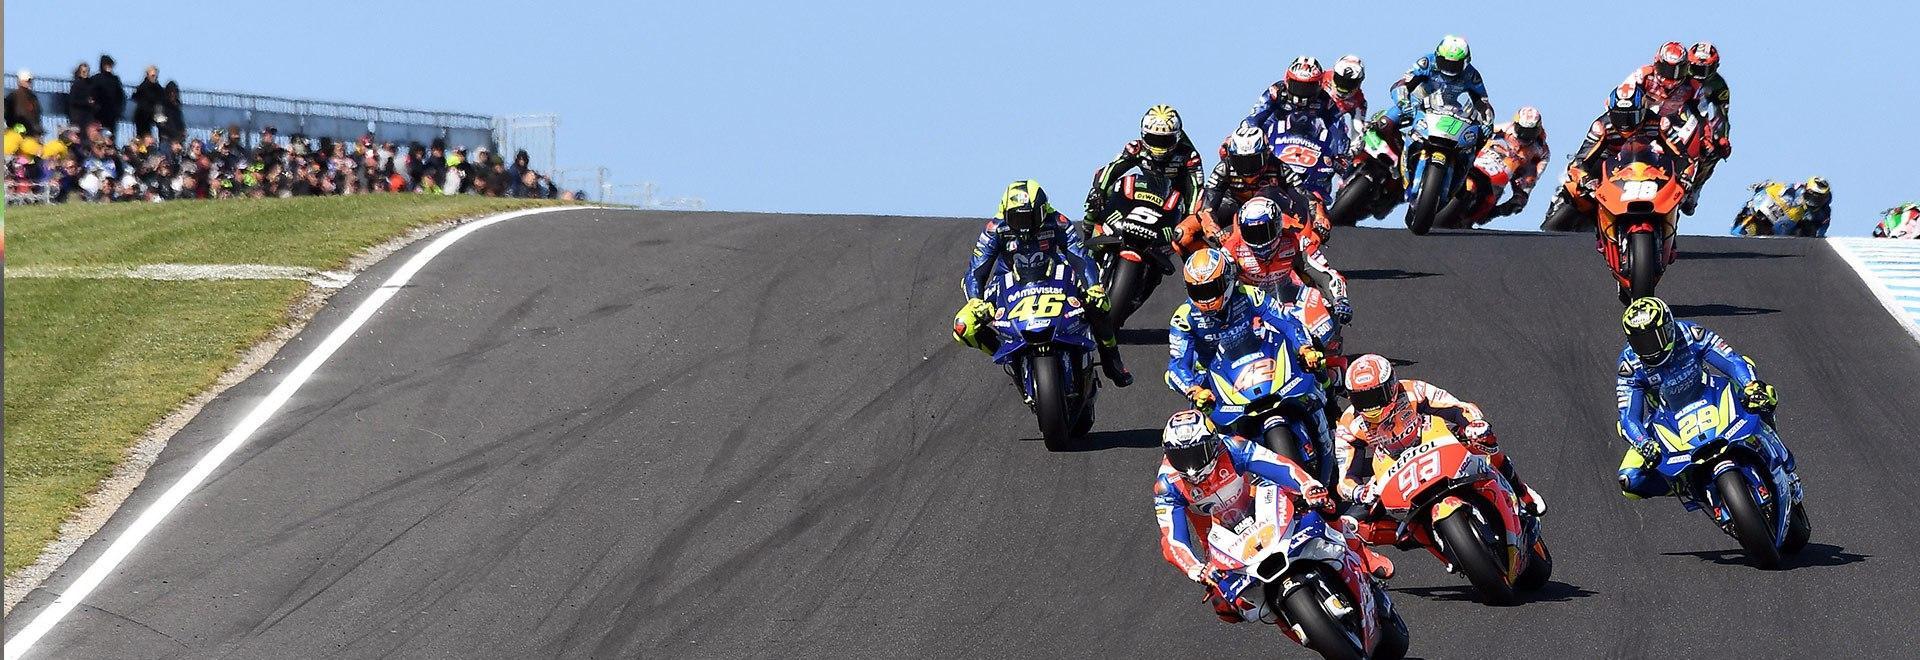 MotoGP Fever